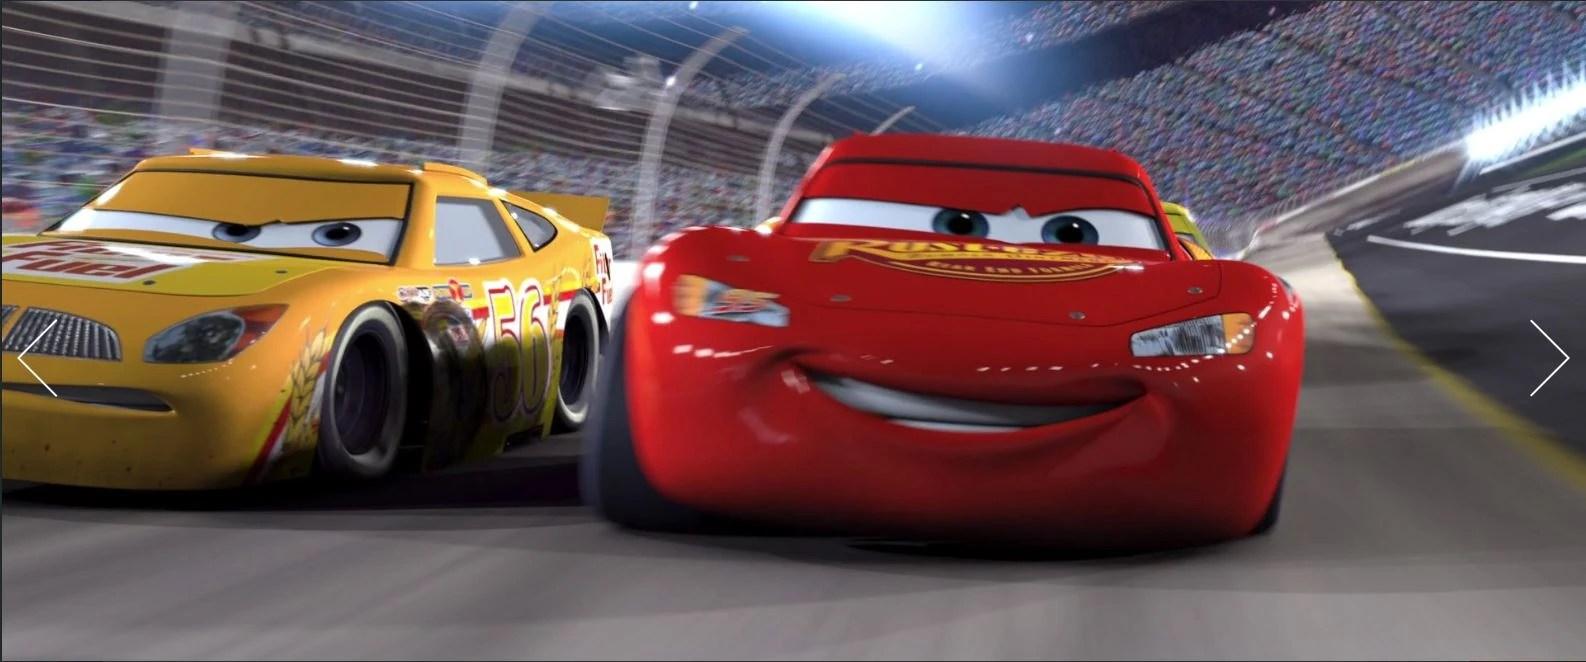 Cars Lightning Mcqueen Disney Wiki